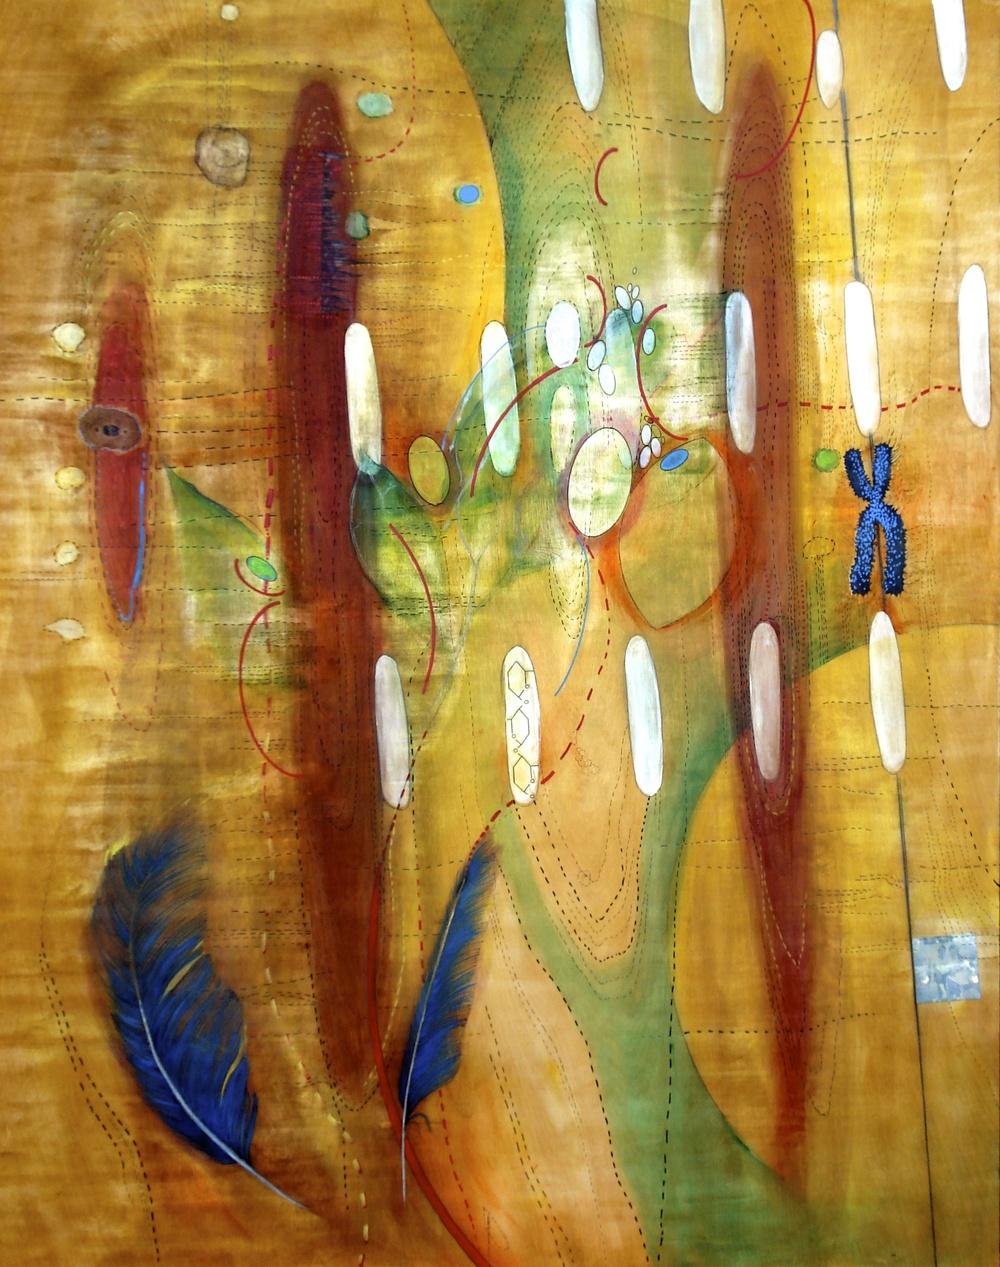 Evocation, 5' x 4', mixed media on wood